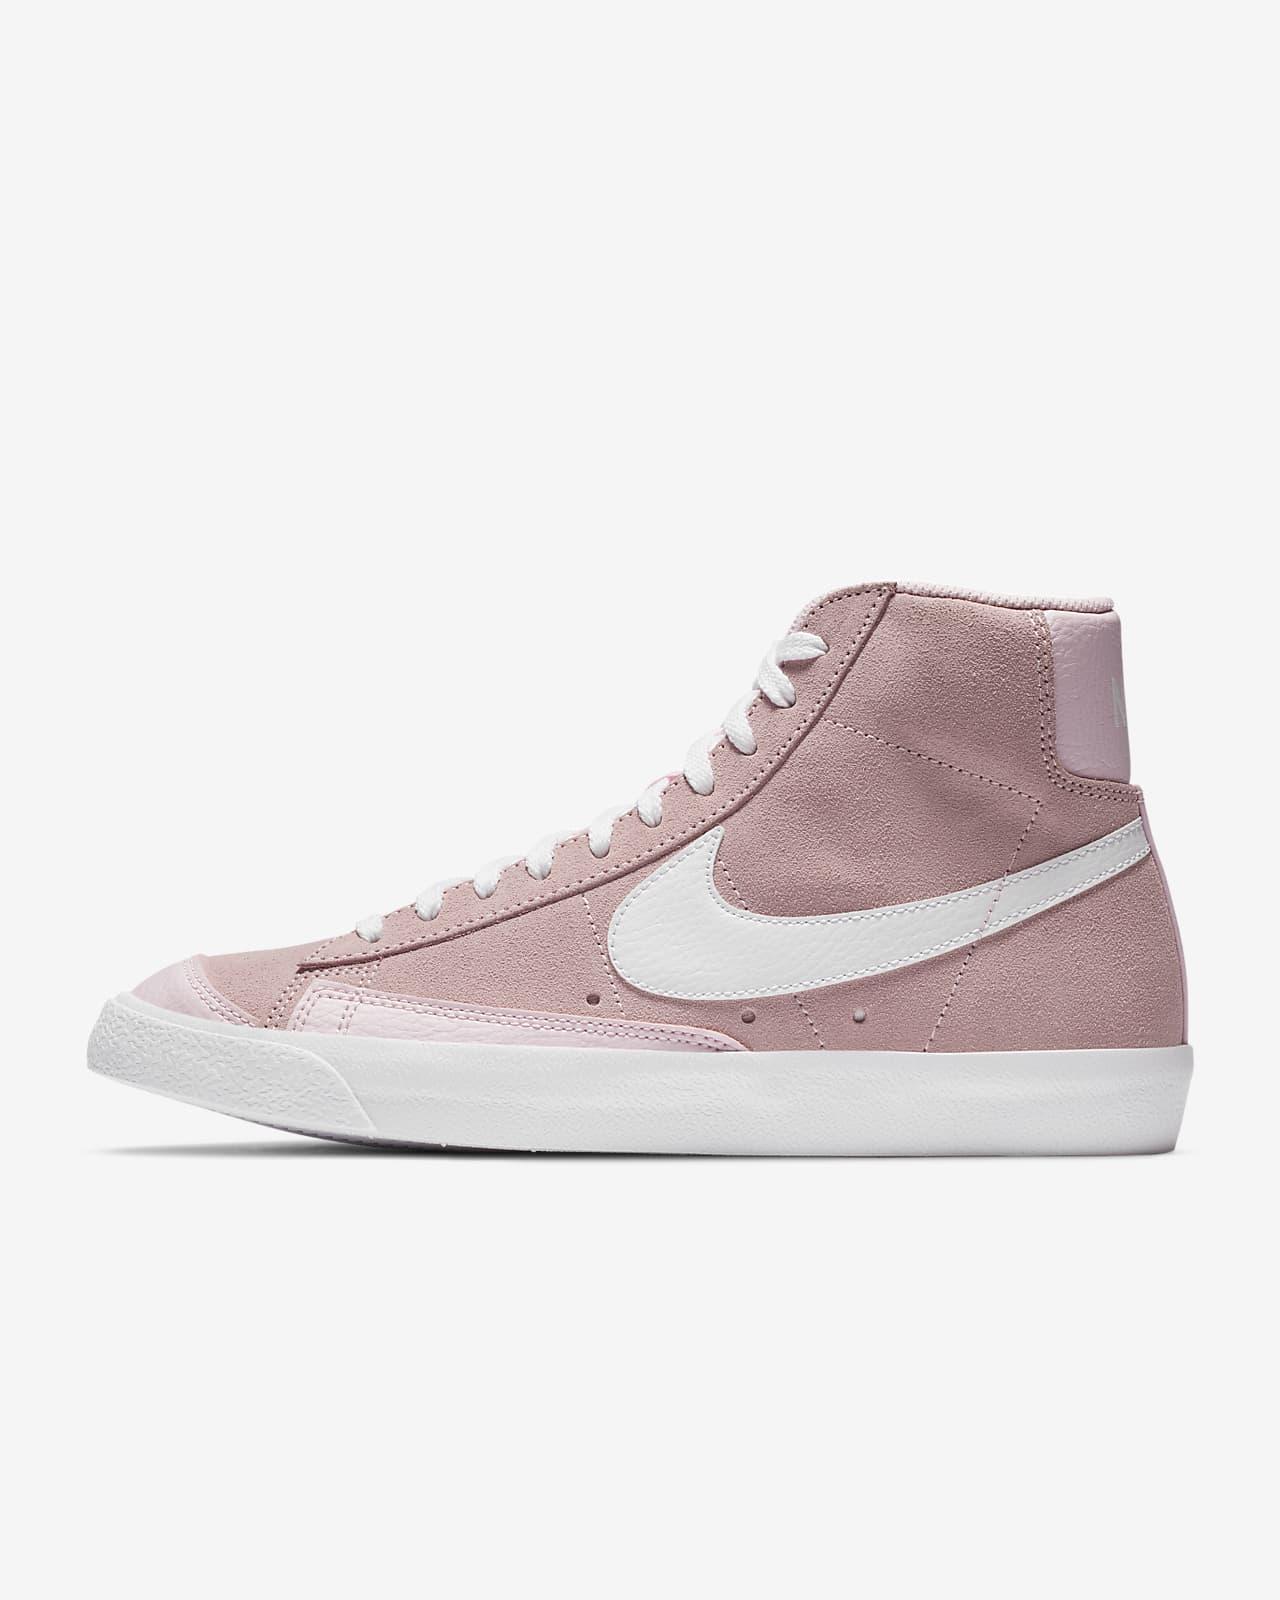 Nike Blazer Mid Vintage '77 Damenschuh